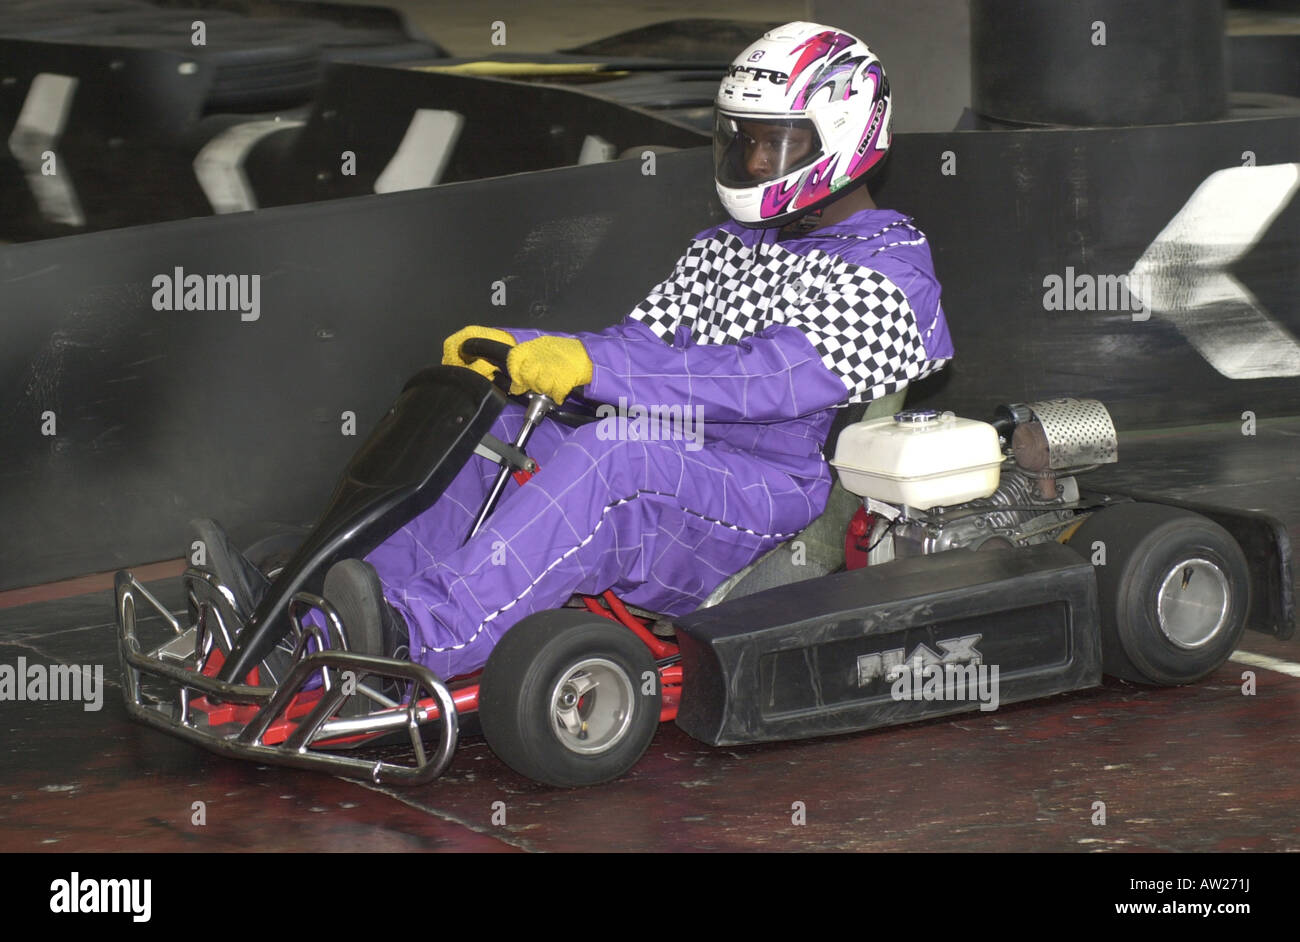 Go Kart Track Stockfotos & Go Kart Track Bilder - Alamy